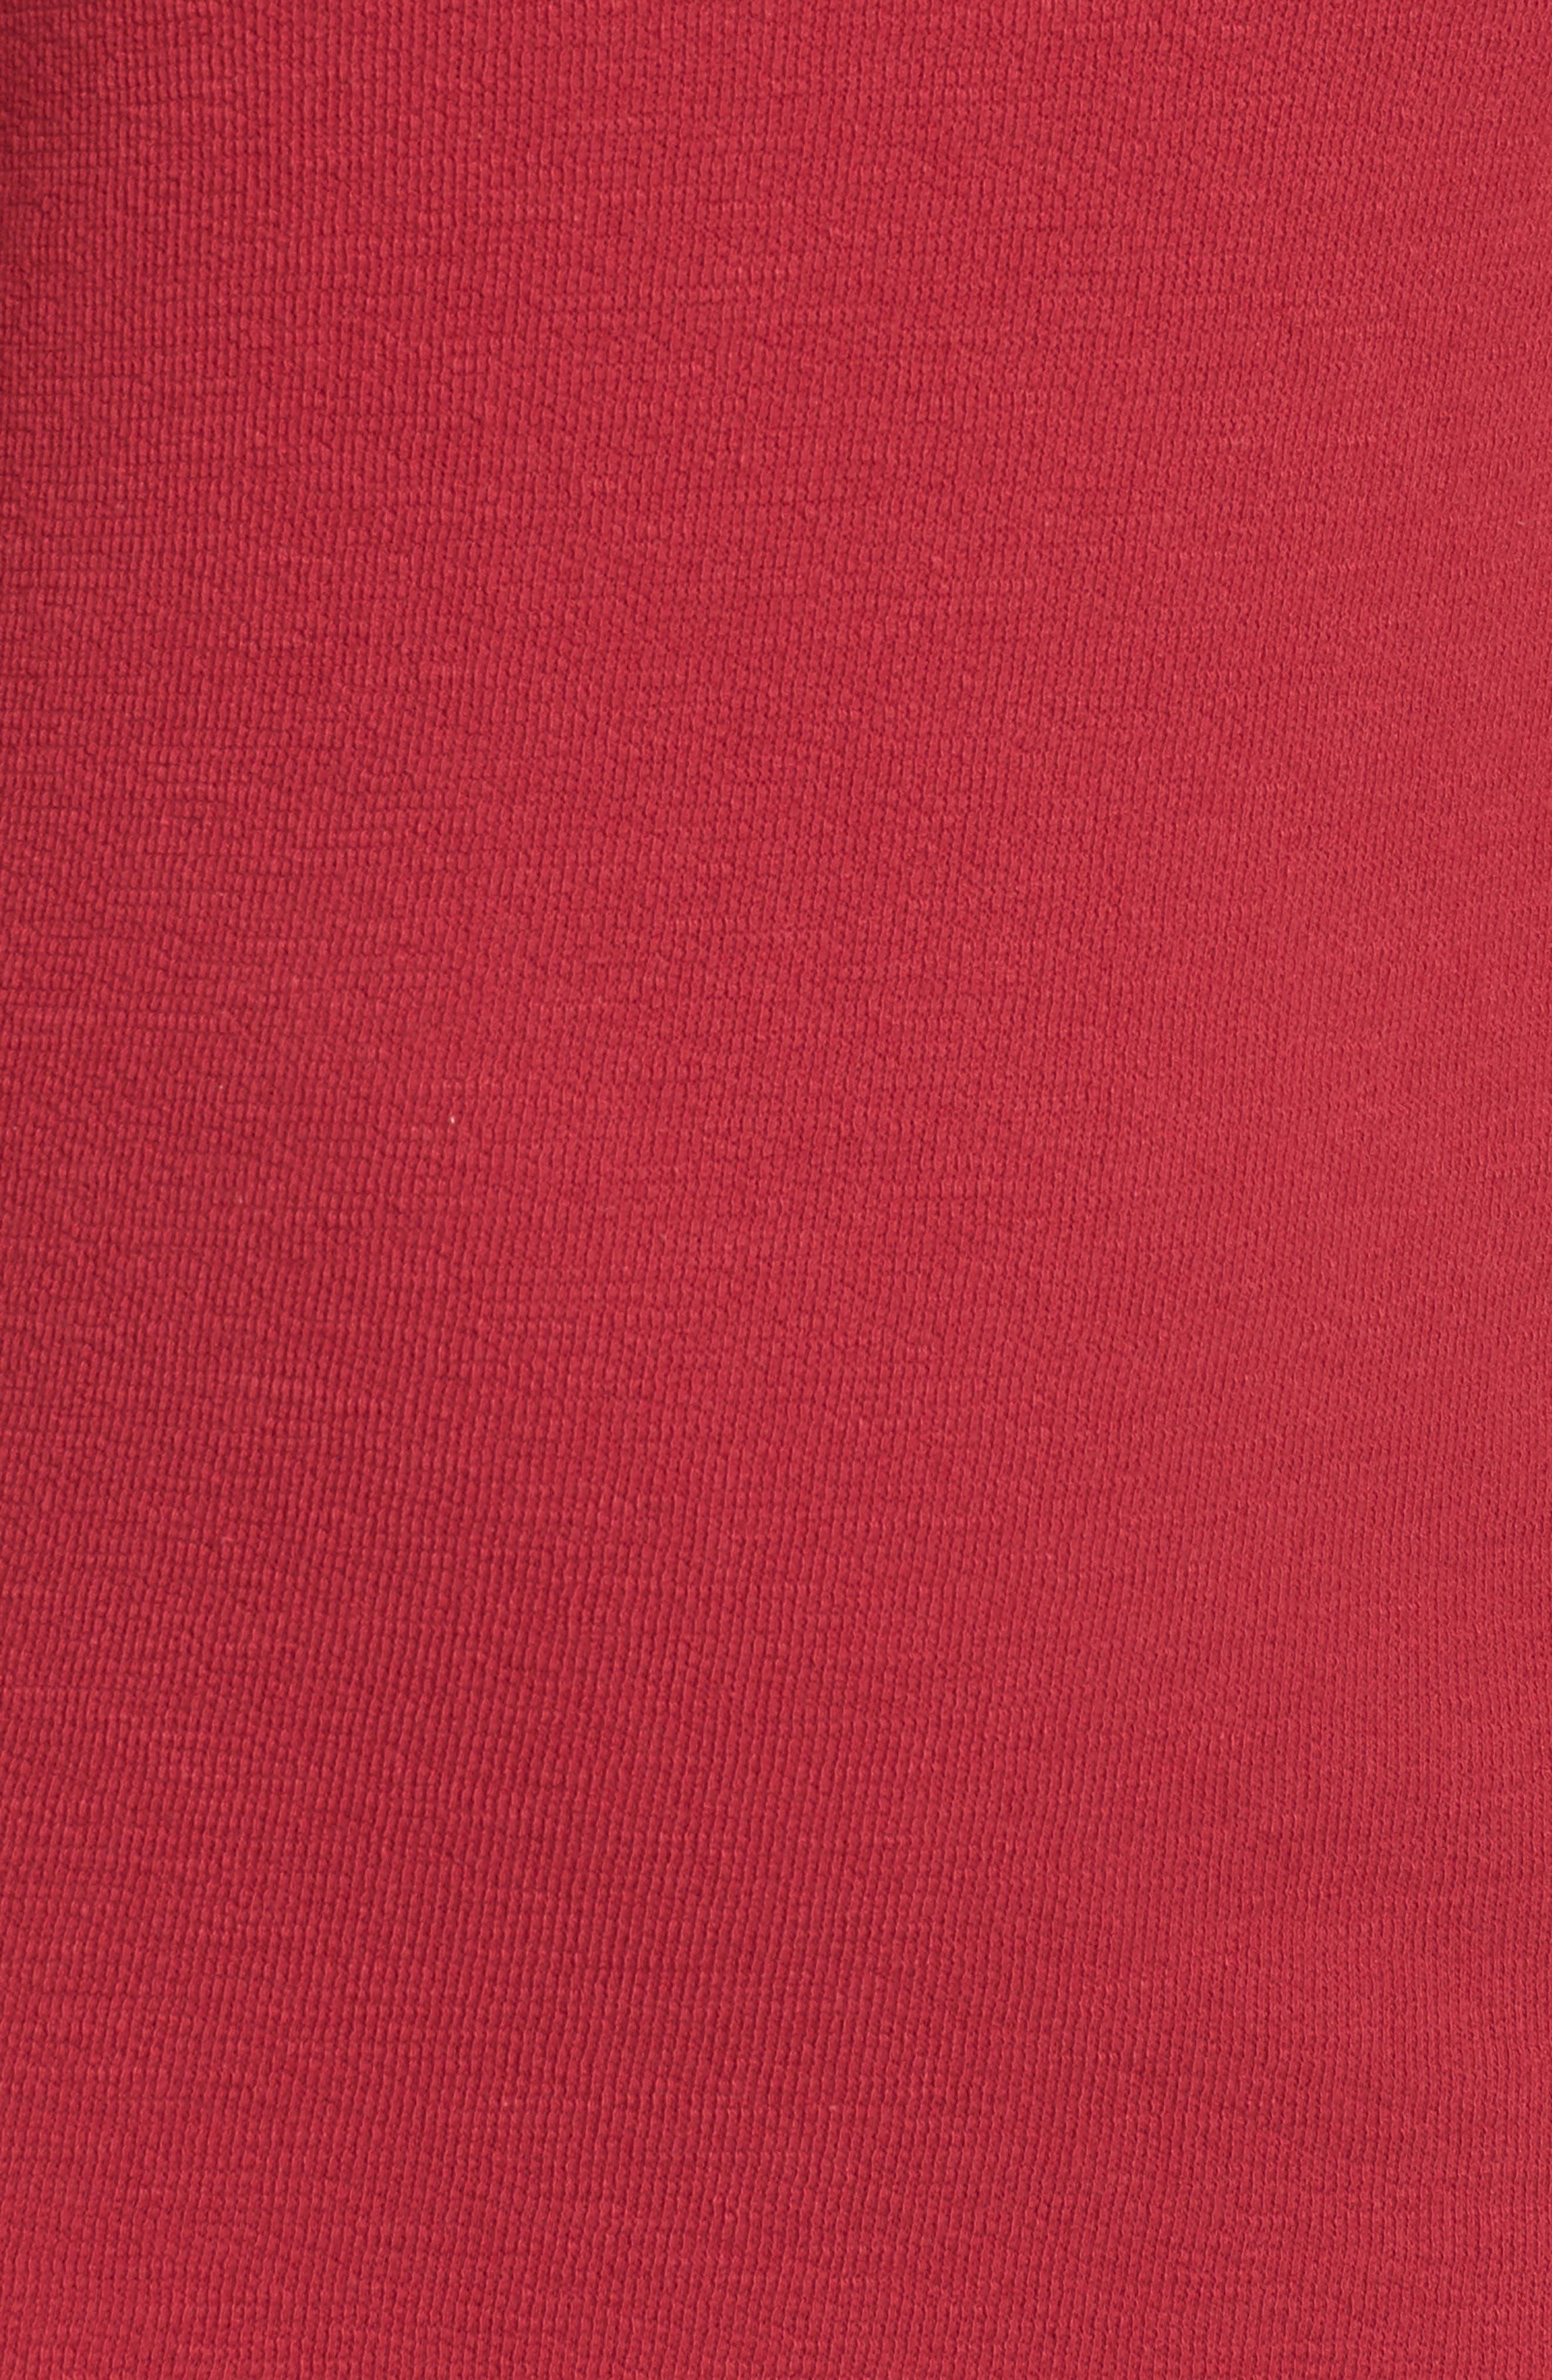 Ruffle Sleeve Knit Dress,                             Alternate thumbnail 15, color,